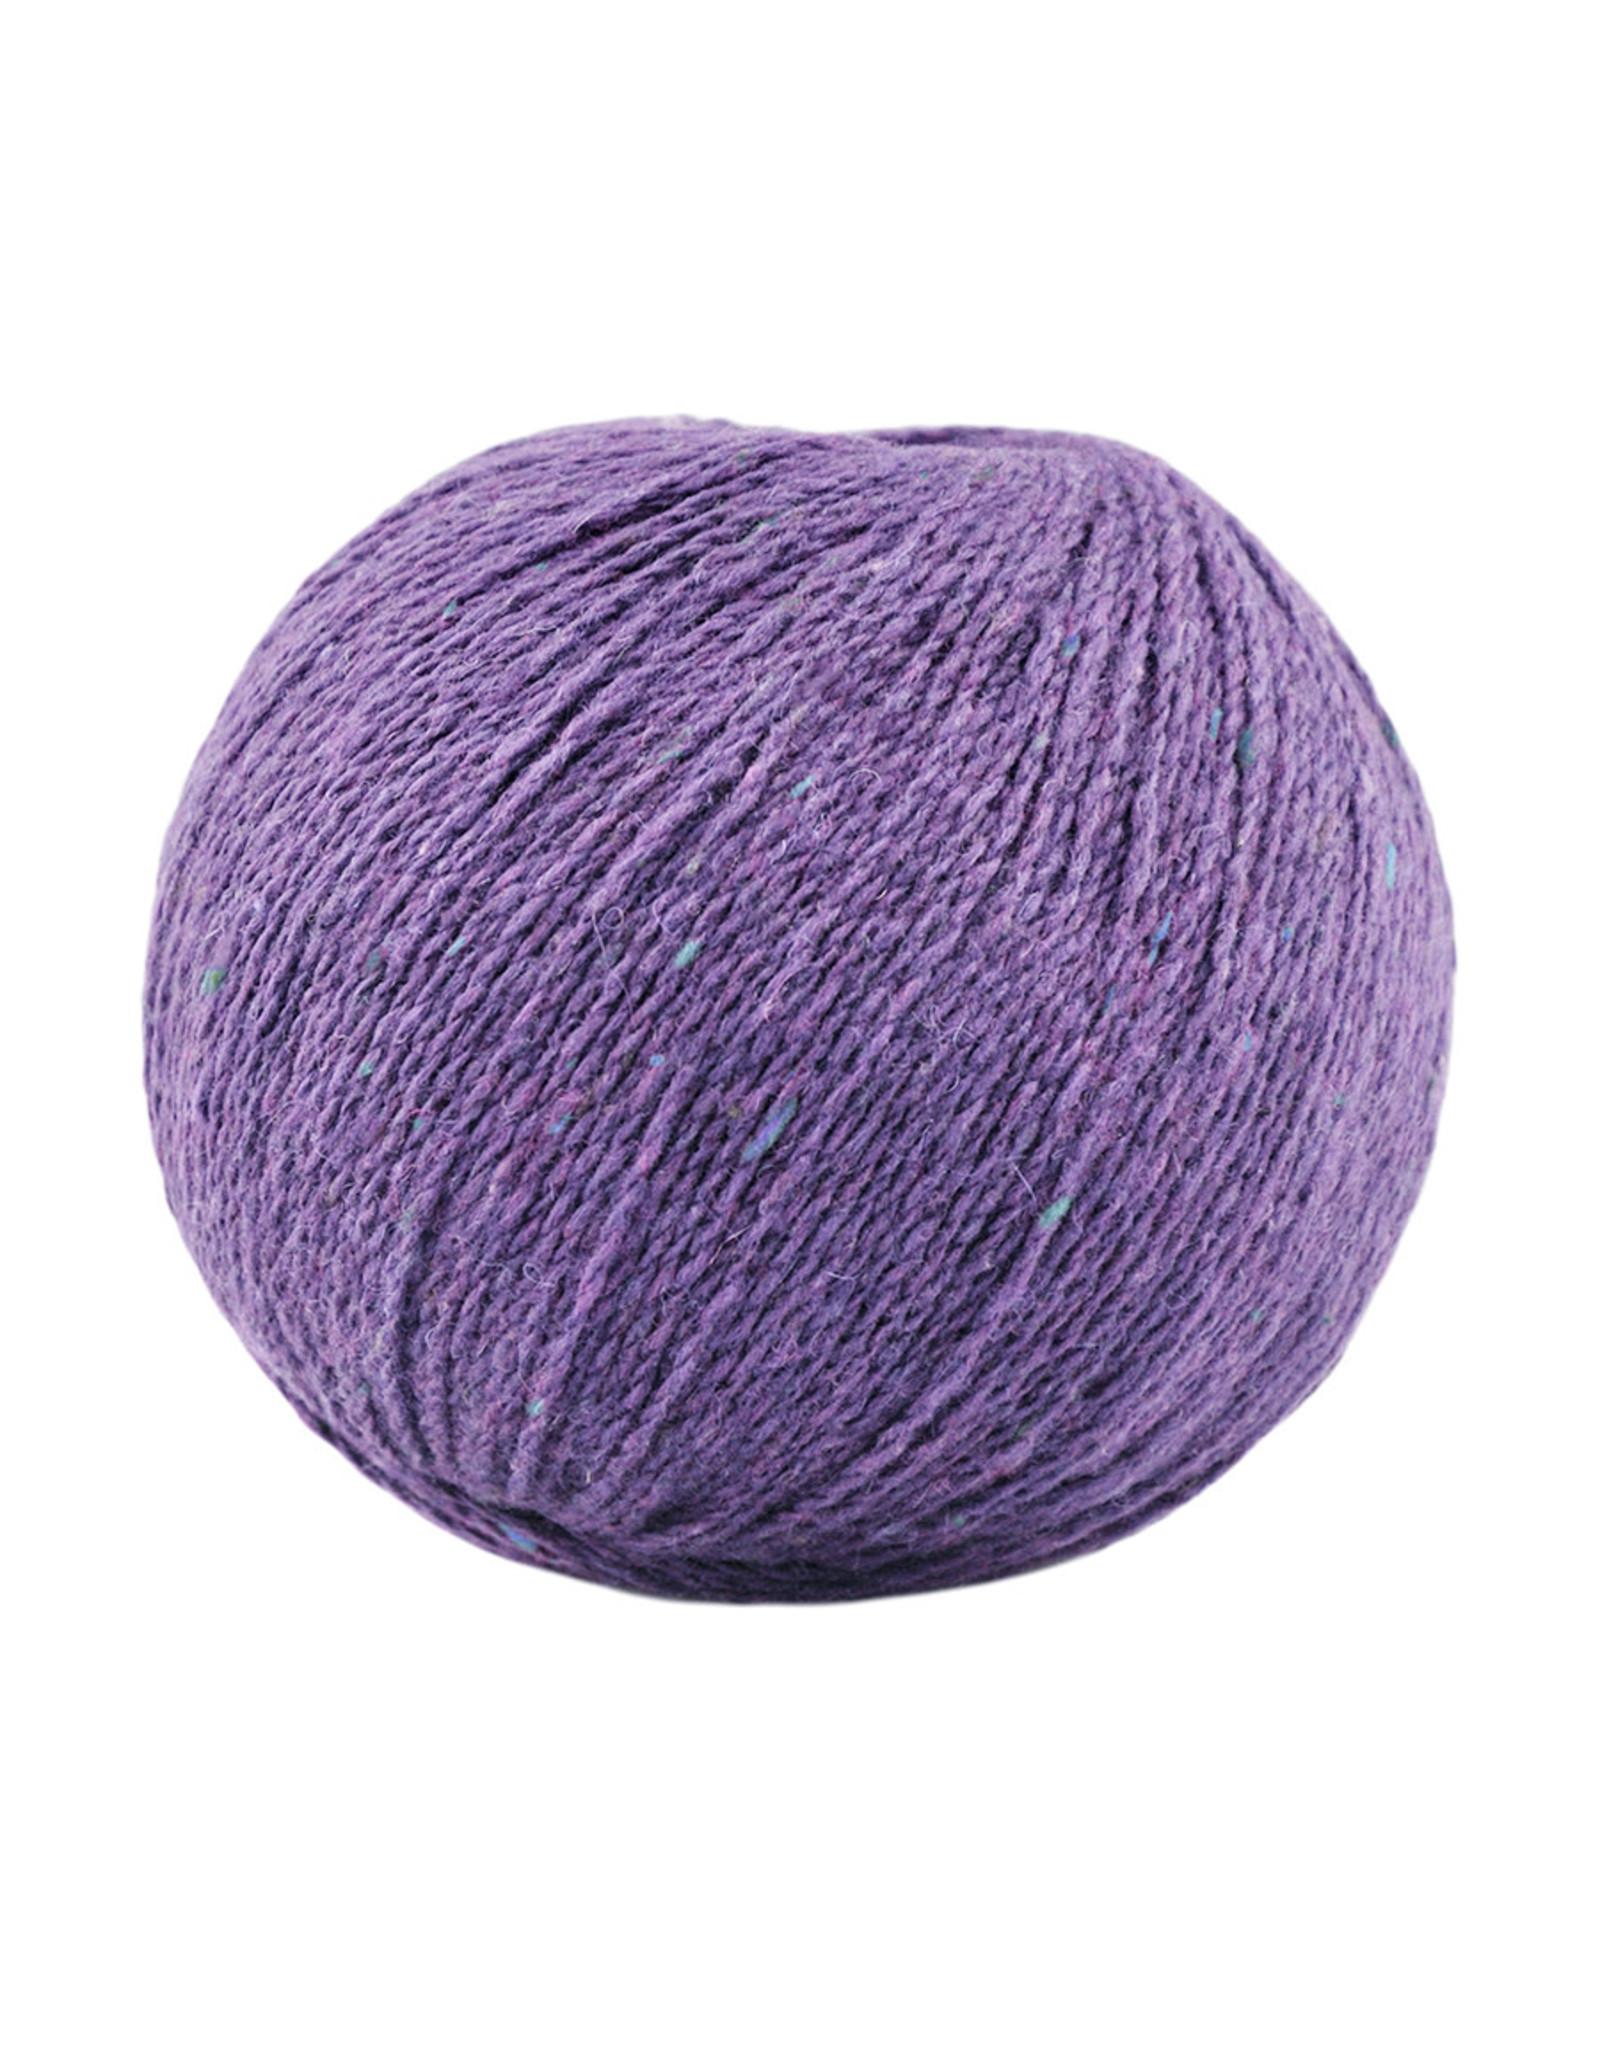 Jody Long Alba #025 Lavender